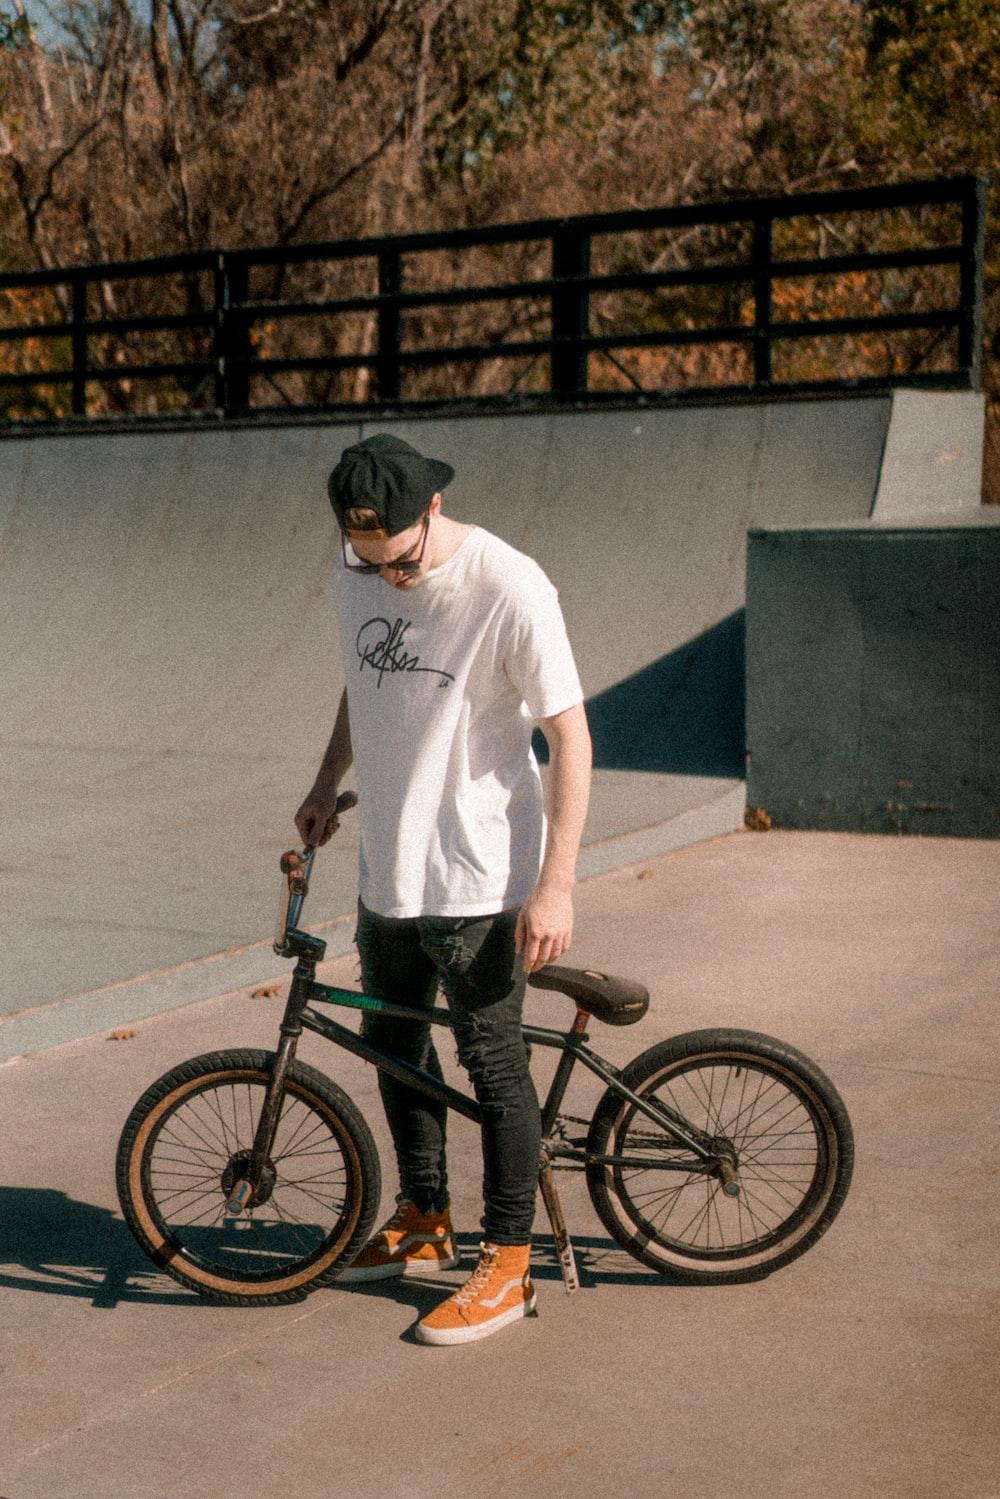 man about to ride on a black BMX bike